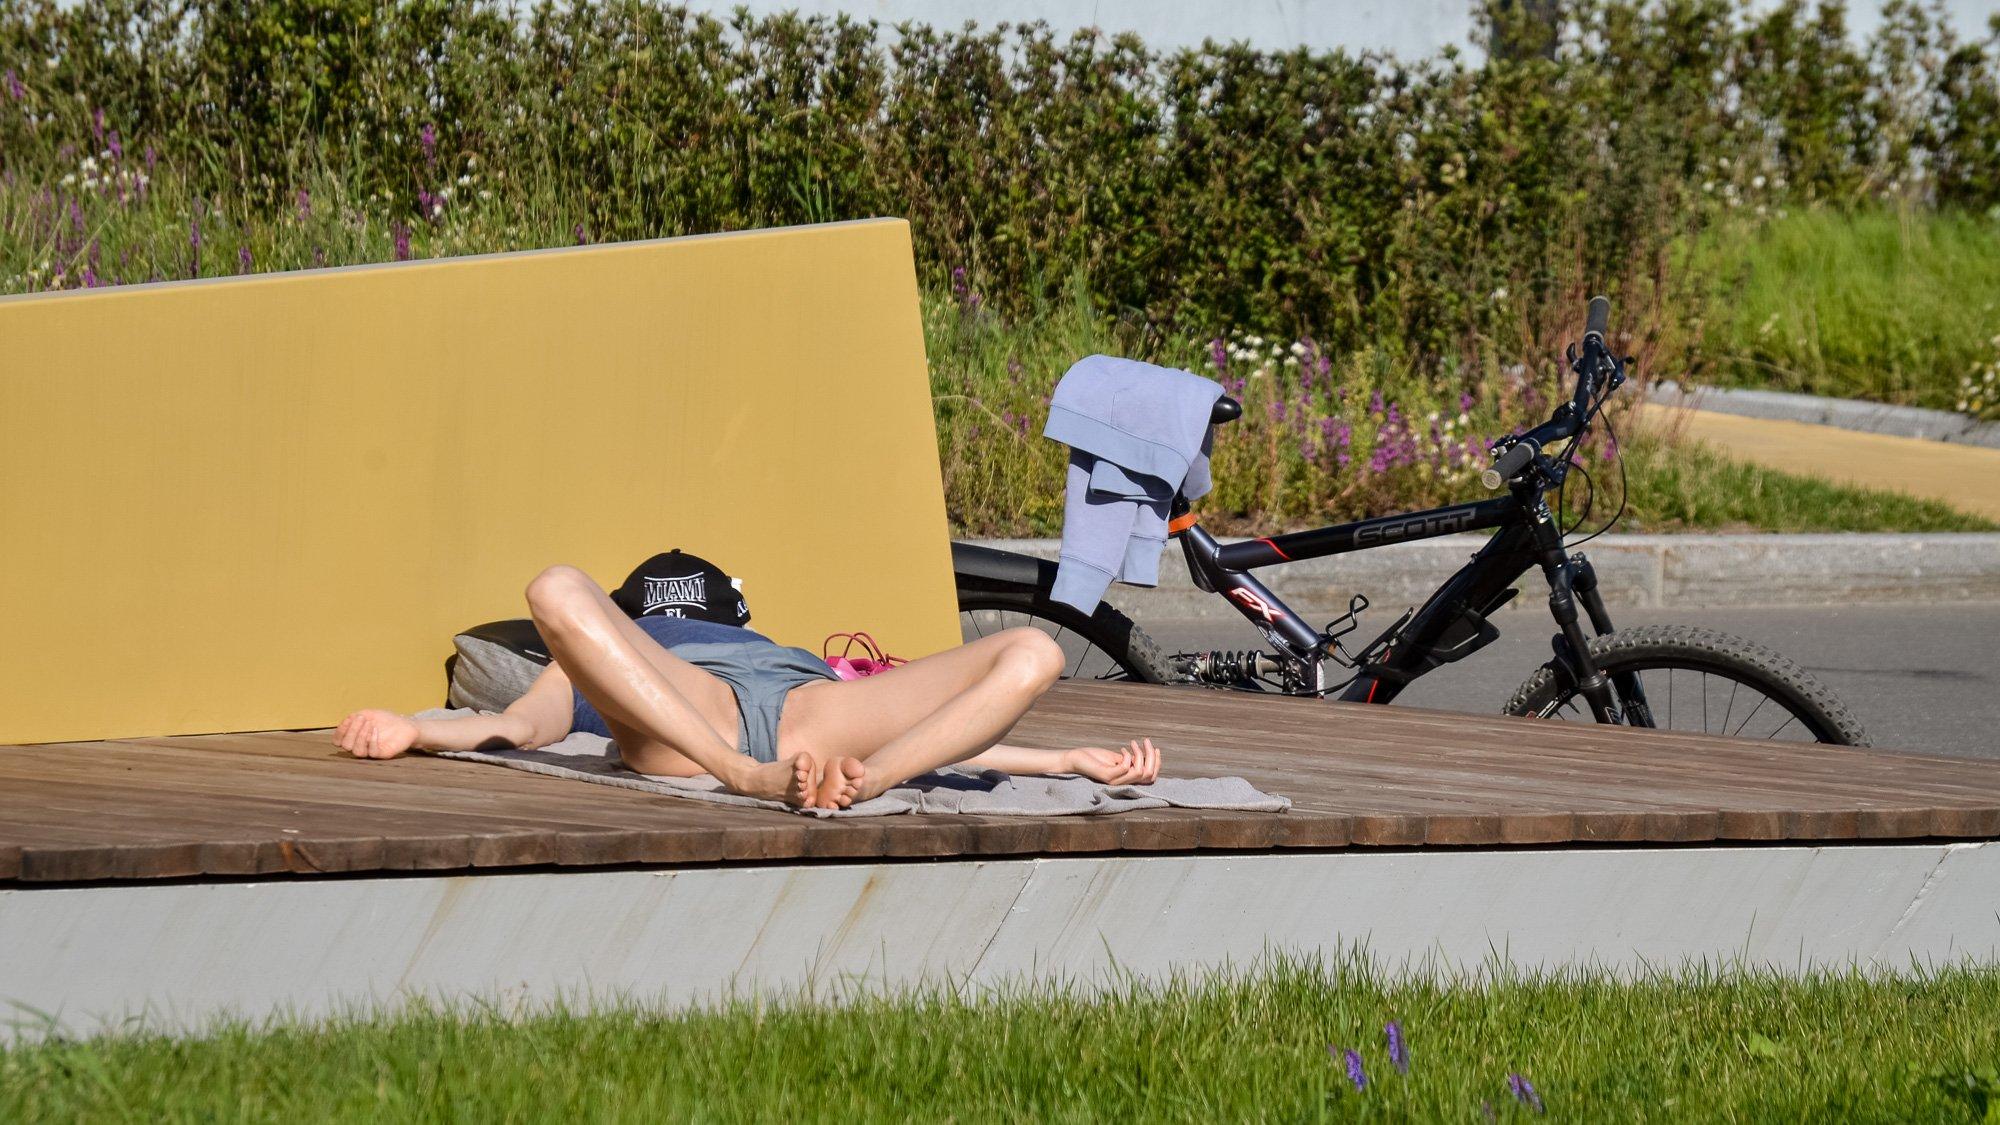 релаксация, лето, солнце, девушка, велосипед ,концептуальное, гламур, Верещако Валерий